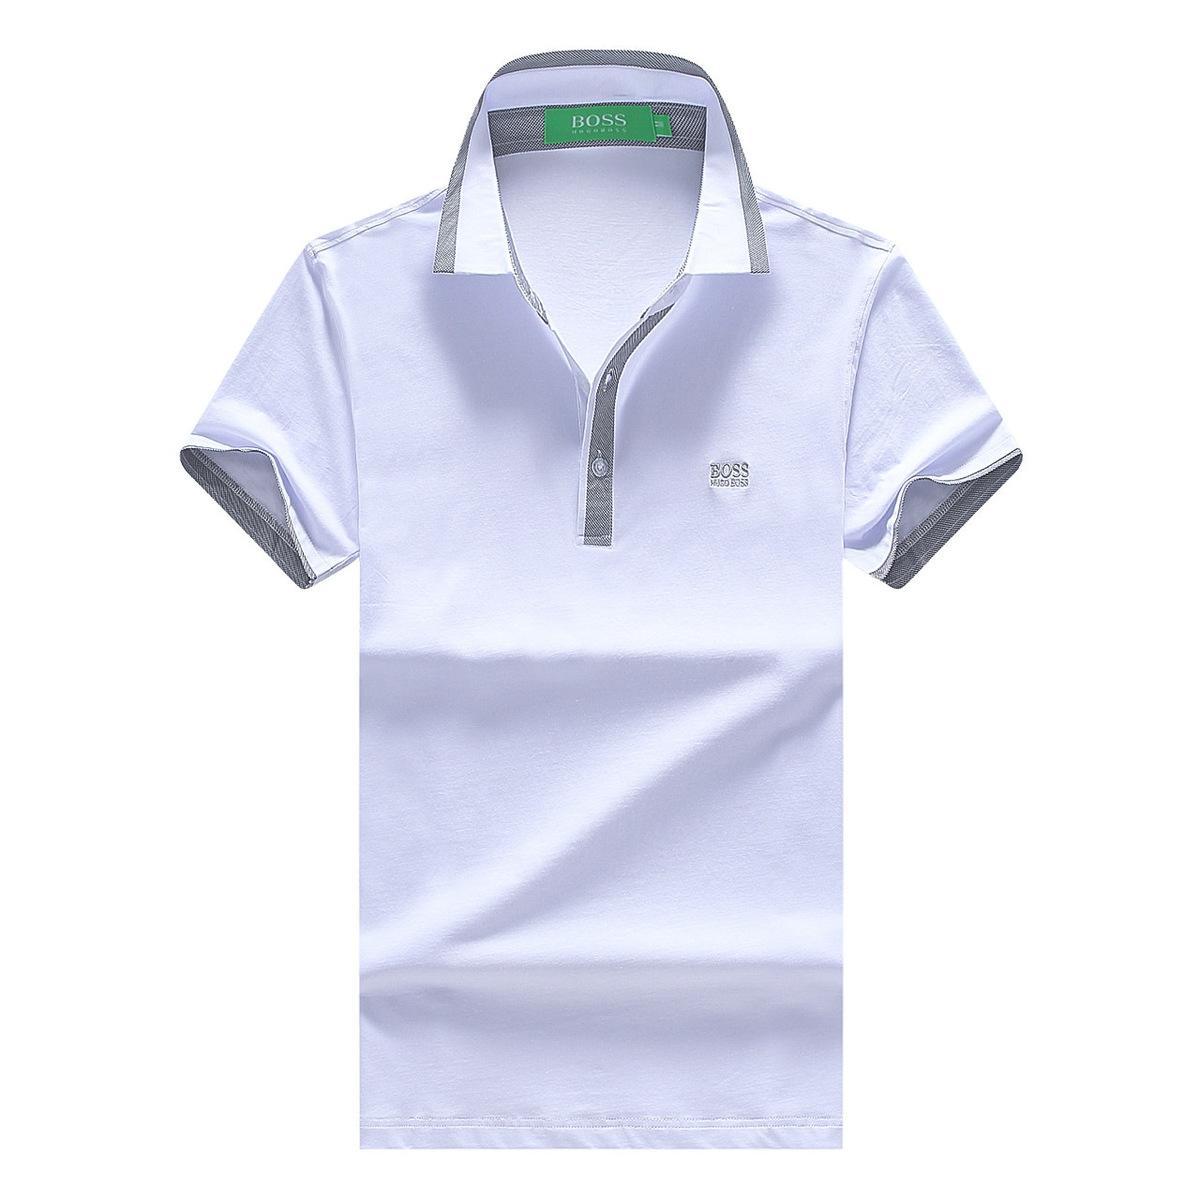 Urban Fashion Youth Concise Men s Lapel Pure Cotton Short Sleeve T ... ec9be2bd94